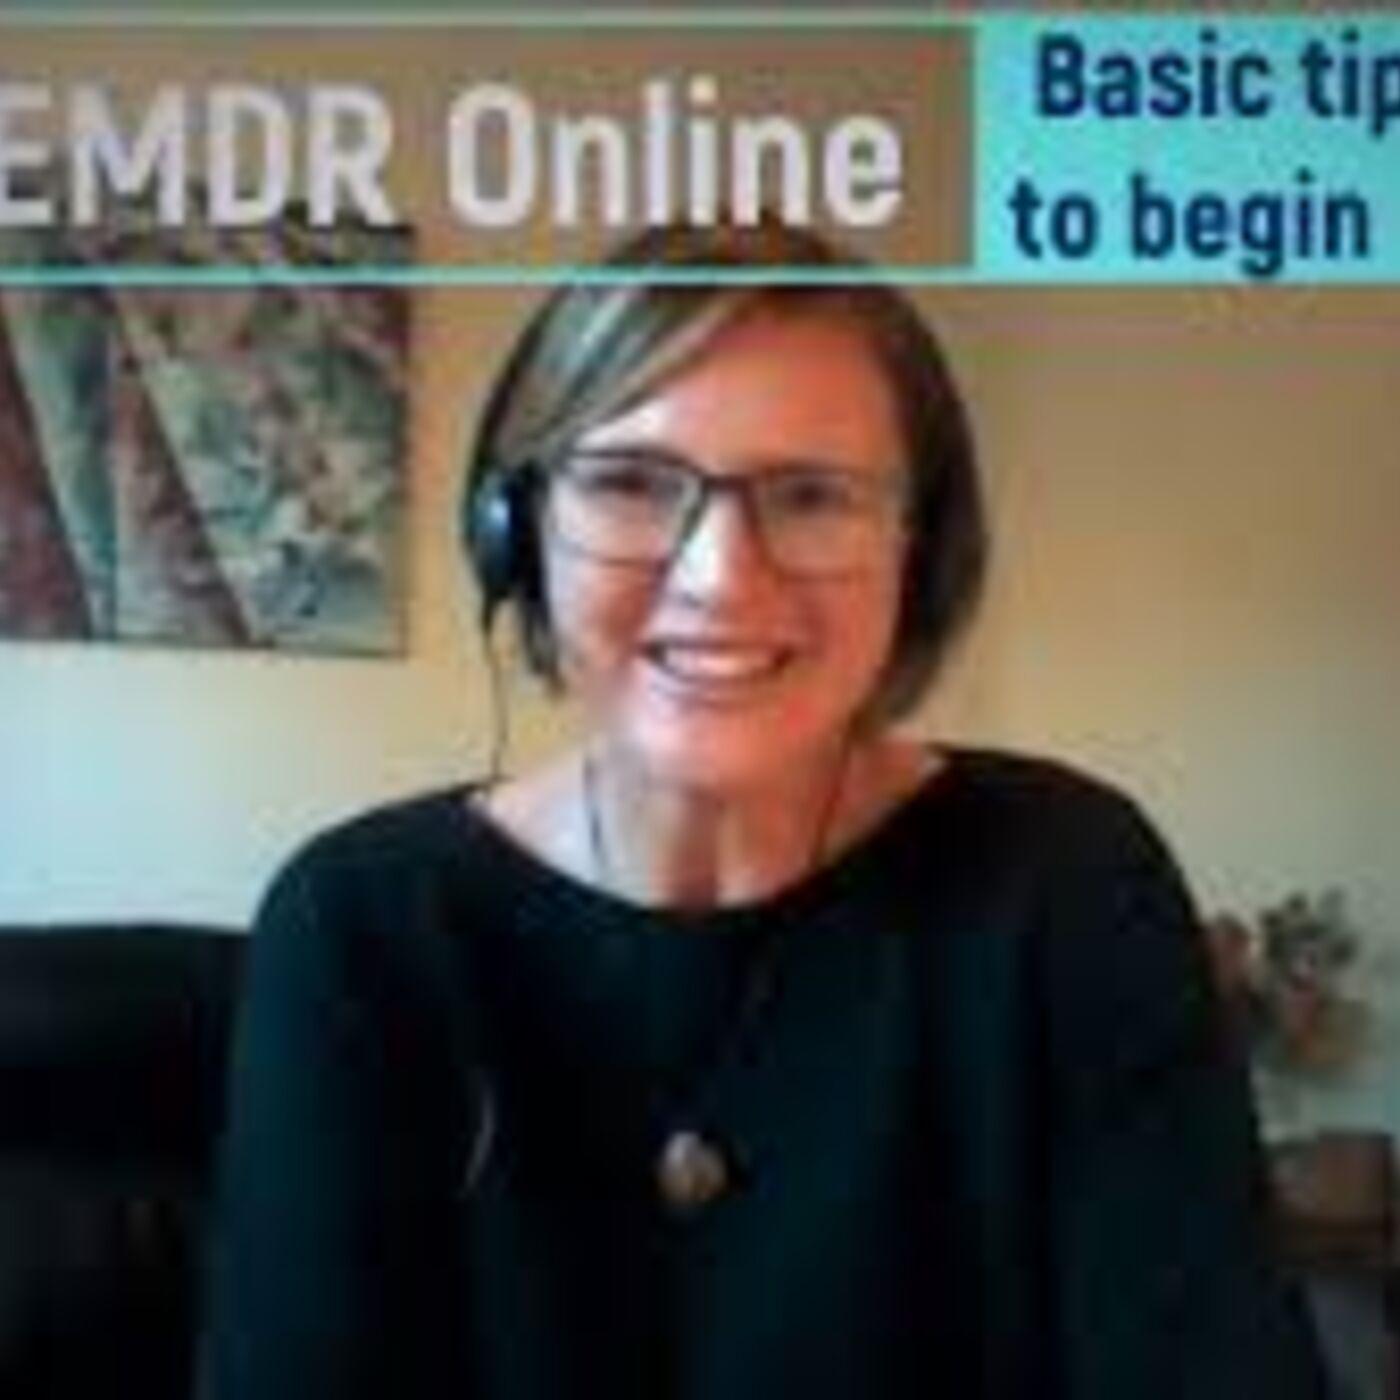 Episode 14: EMDR and the Safe and Sound Protocol....... a perfect combination. Dr Sarah Schubert, Psychologist and EMDR instructor talks about blending Polyvagal Theory and the Safe and Sound Protocol within the EMDR framework.